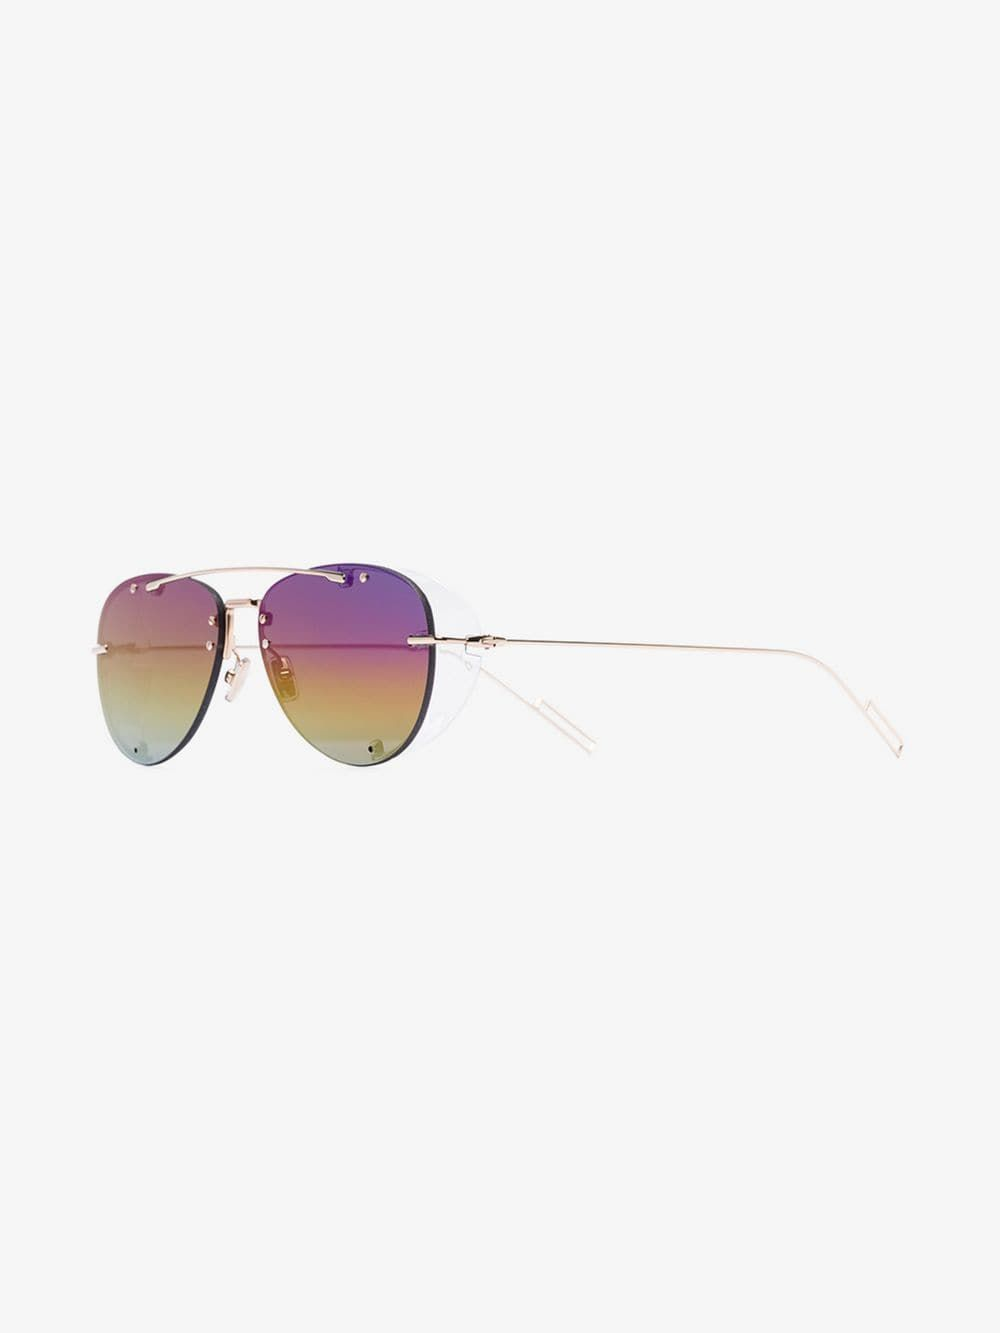 f72728a44560 DIOR DIOR EYEWEAR DIOR CHROMA1 SUNG PURP GLD. #dior Mirrored Sunglasses,  Eyewear,